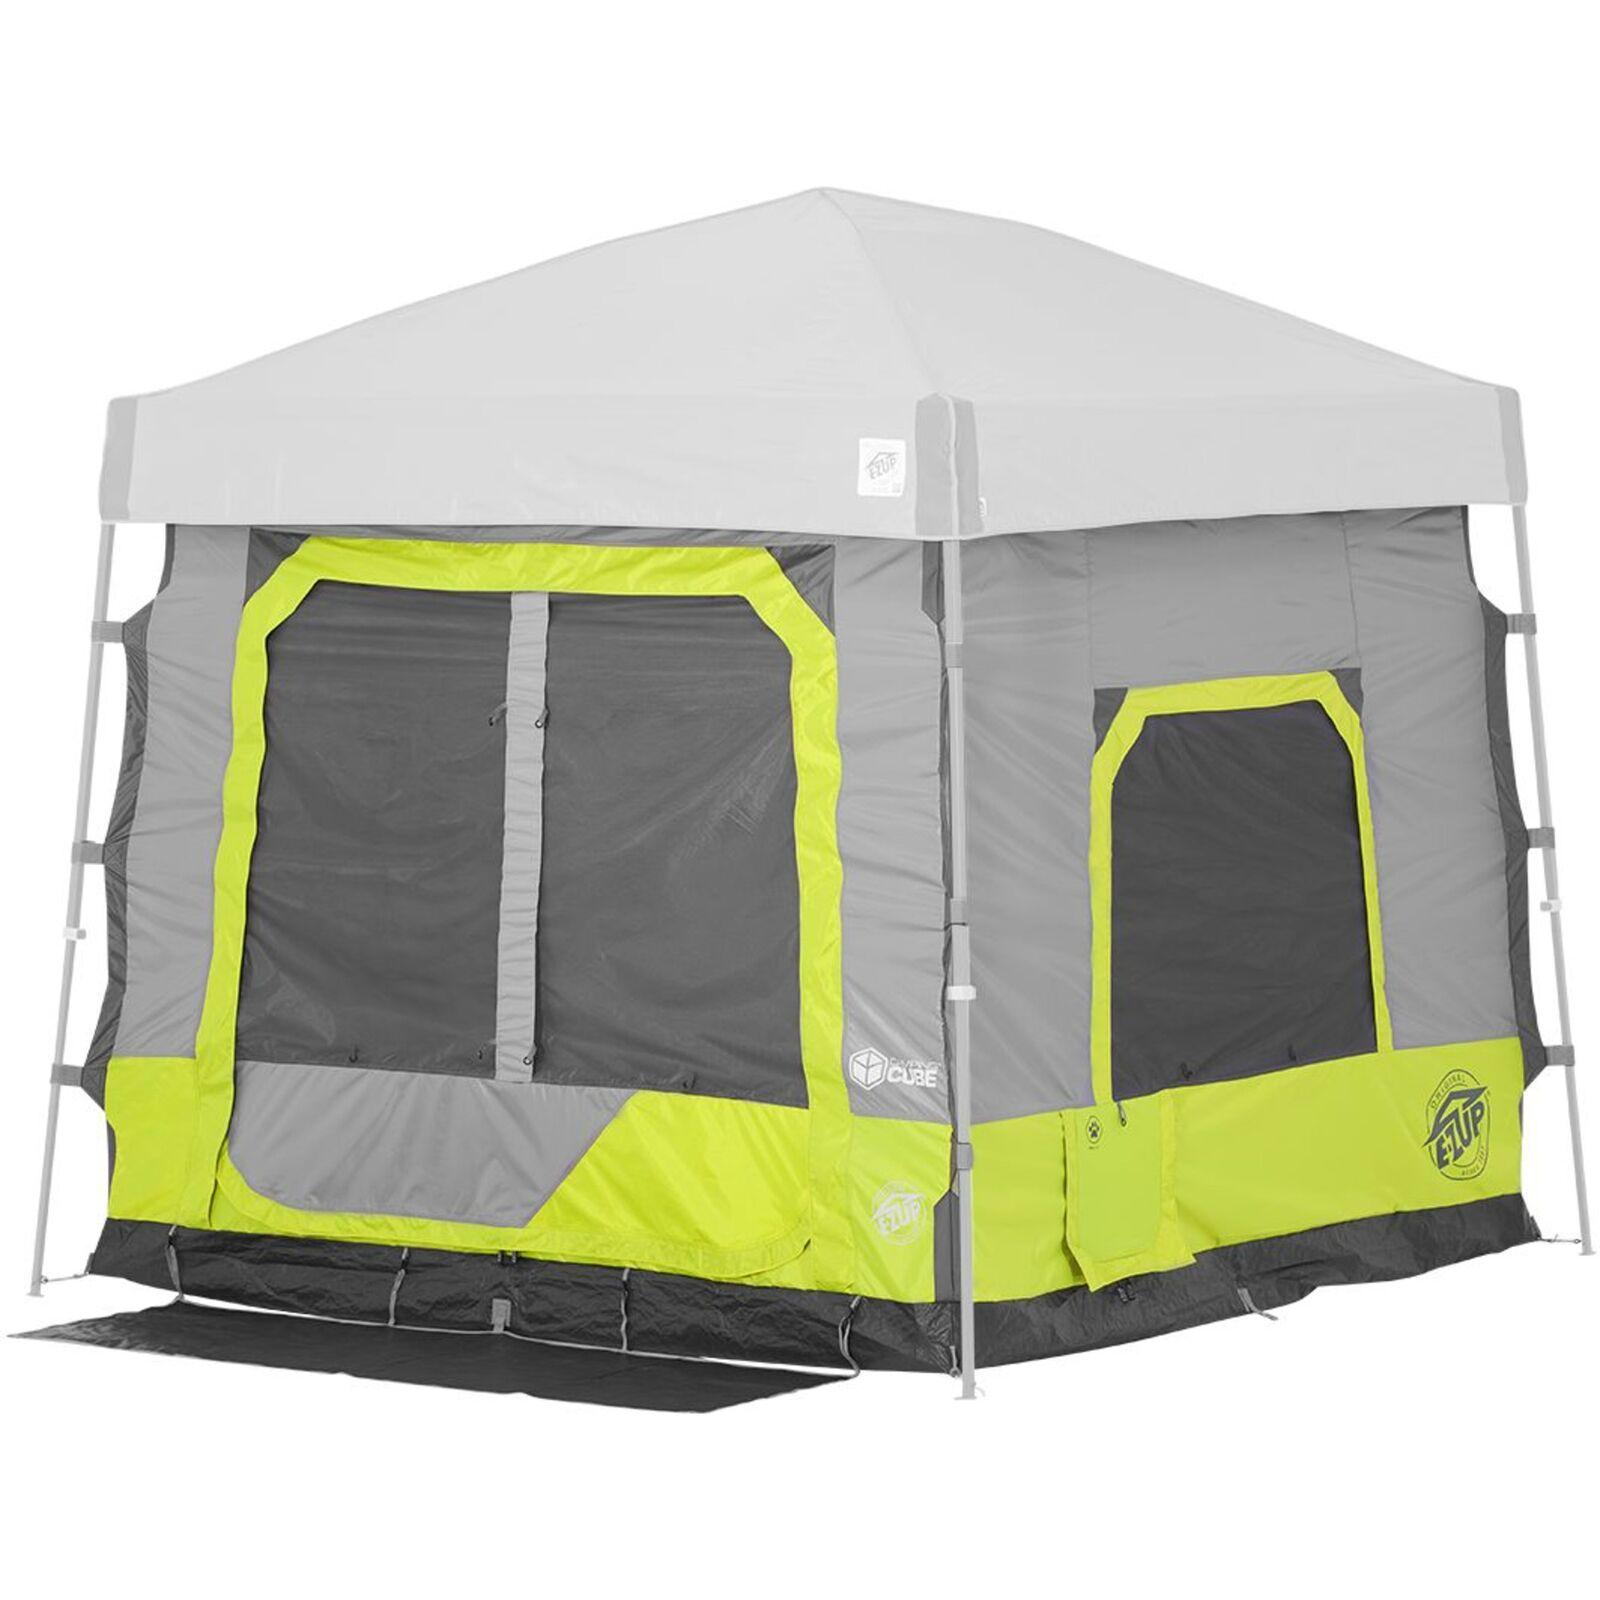 E-Z Up Einhängezelt Camping Cube 5.4 Angled, Limeade, Zelt, limette